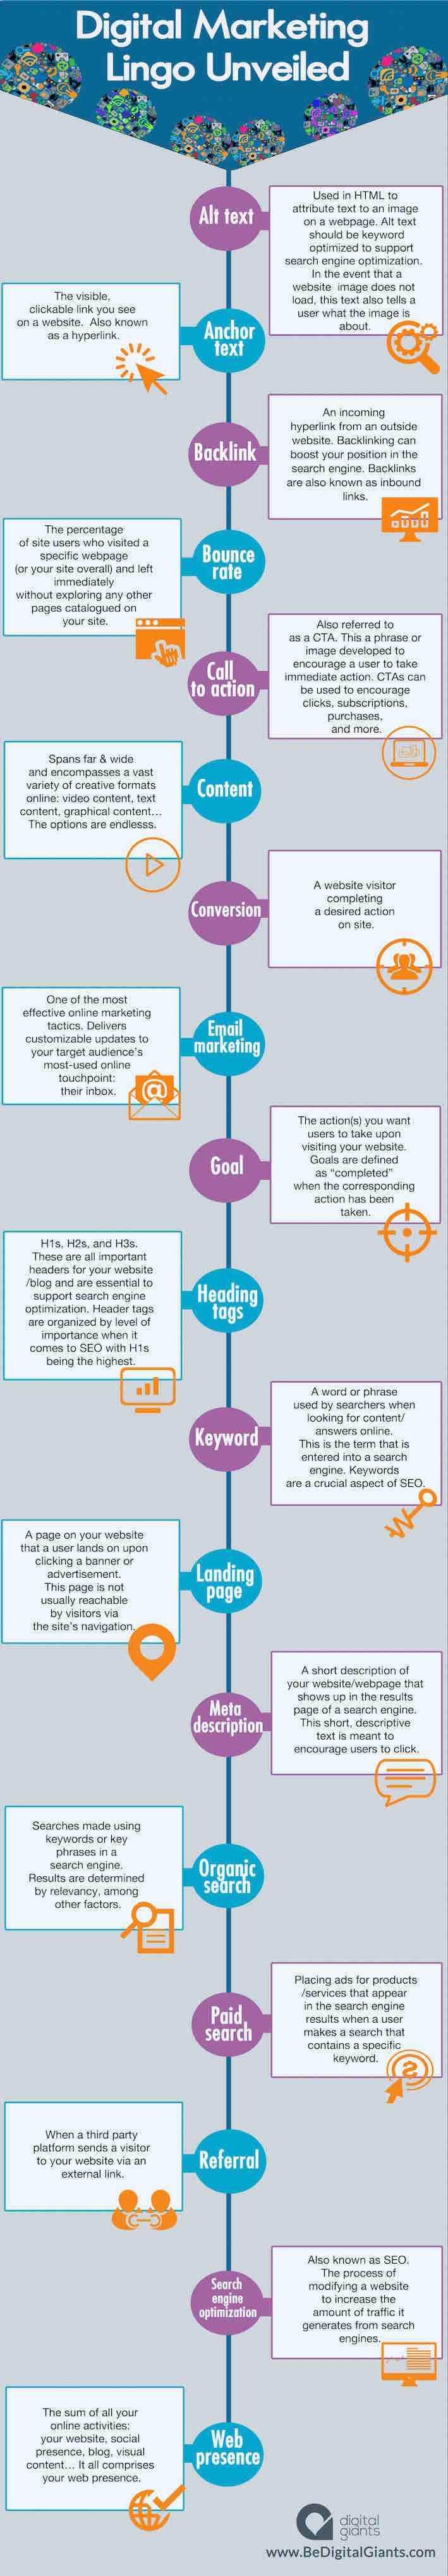 Digitial Marketing Terms